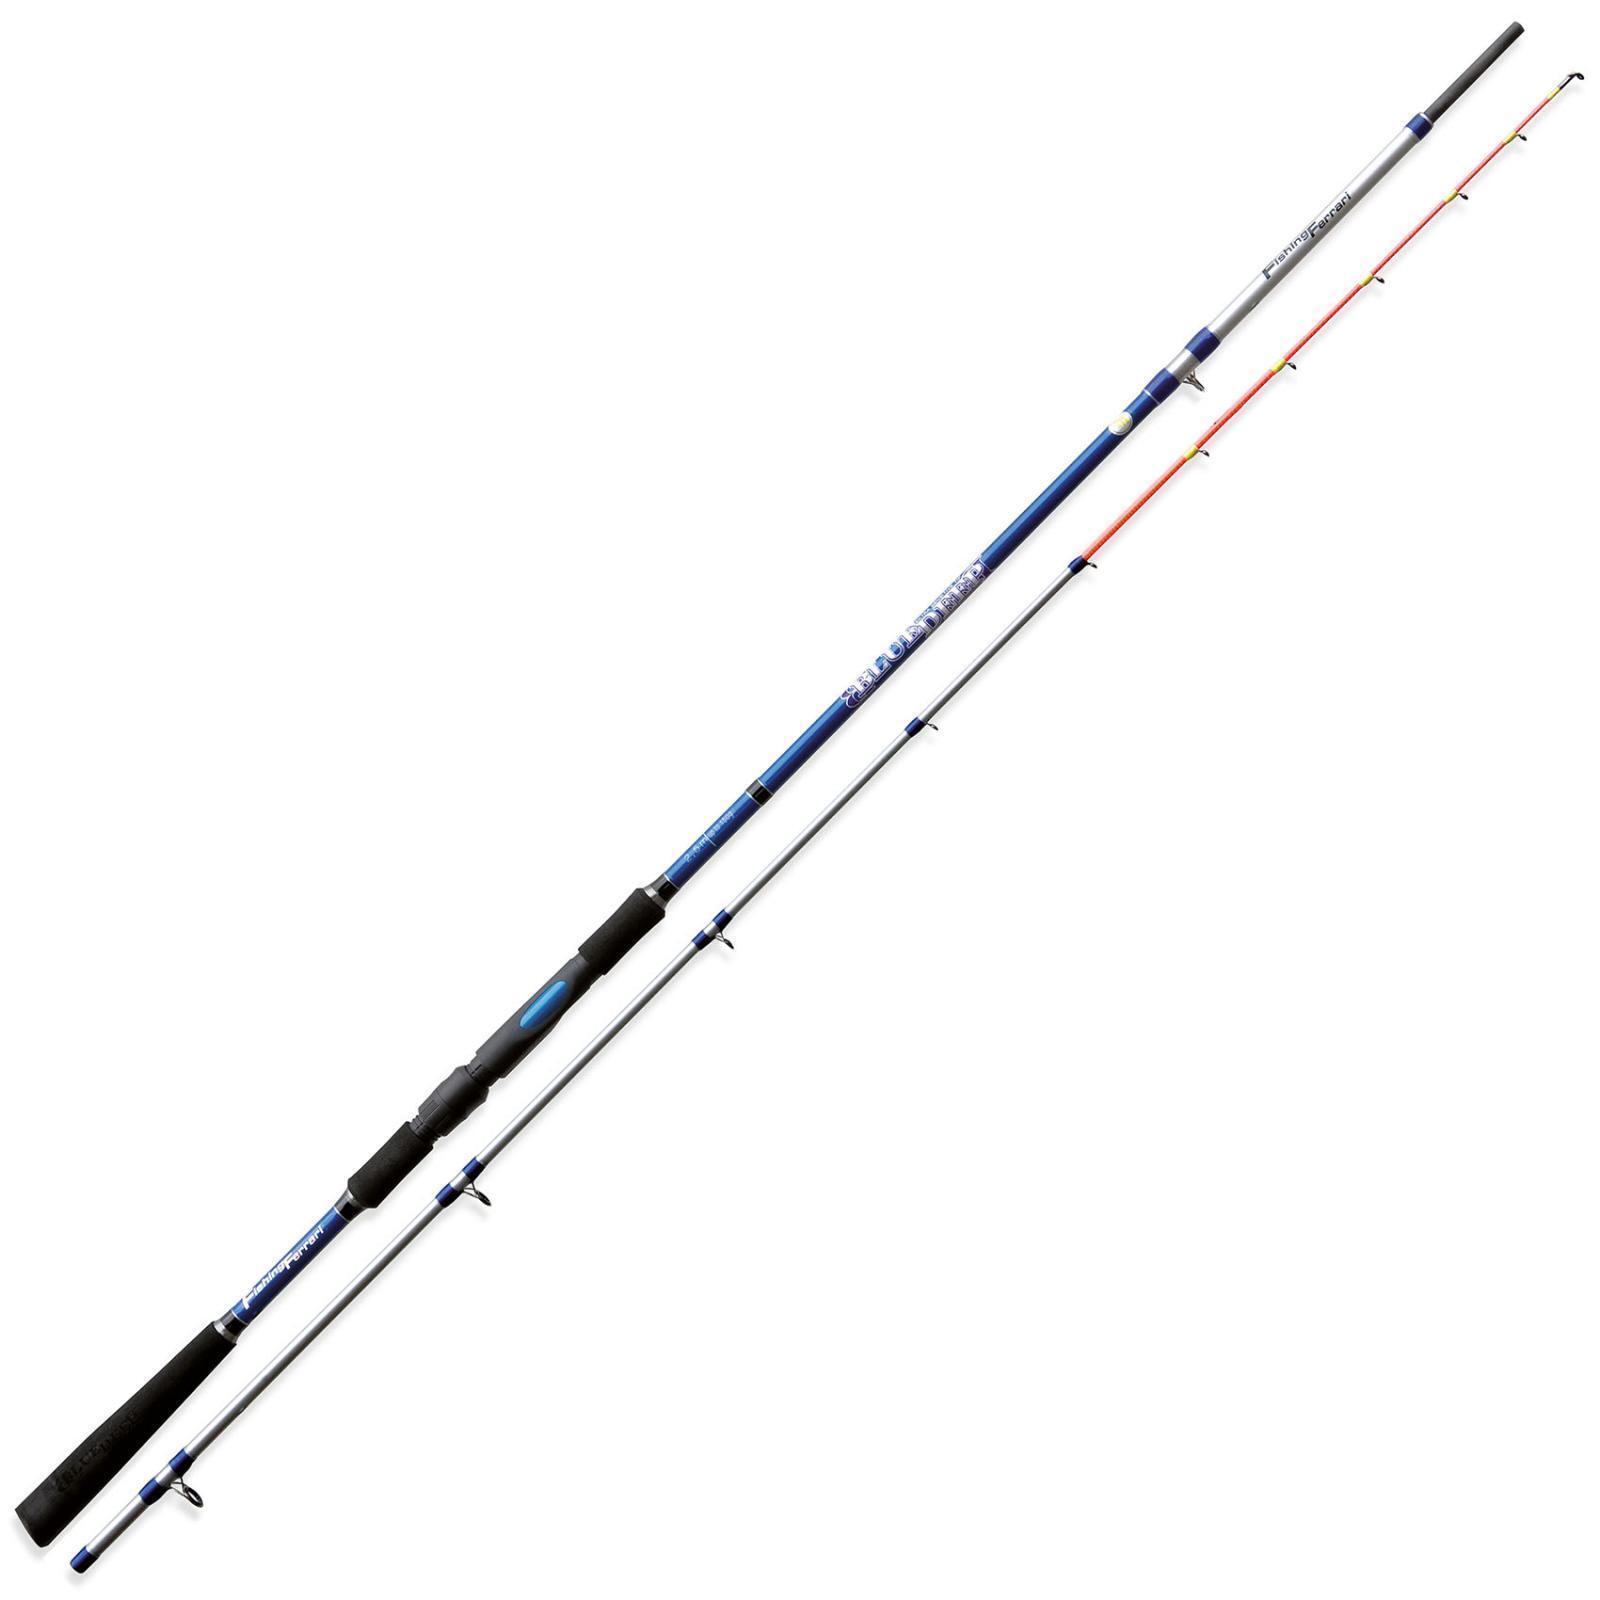 2230625 Canna Fishing Ferrari Deep blu 2,50m 150 Gr Pesca Barca Bolentino CAS